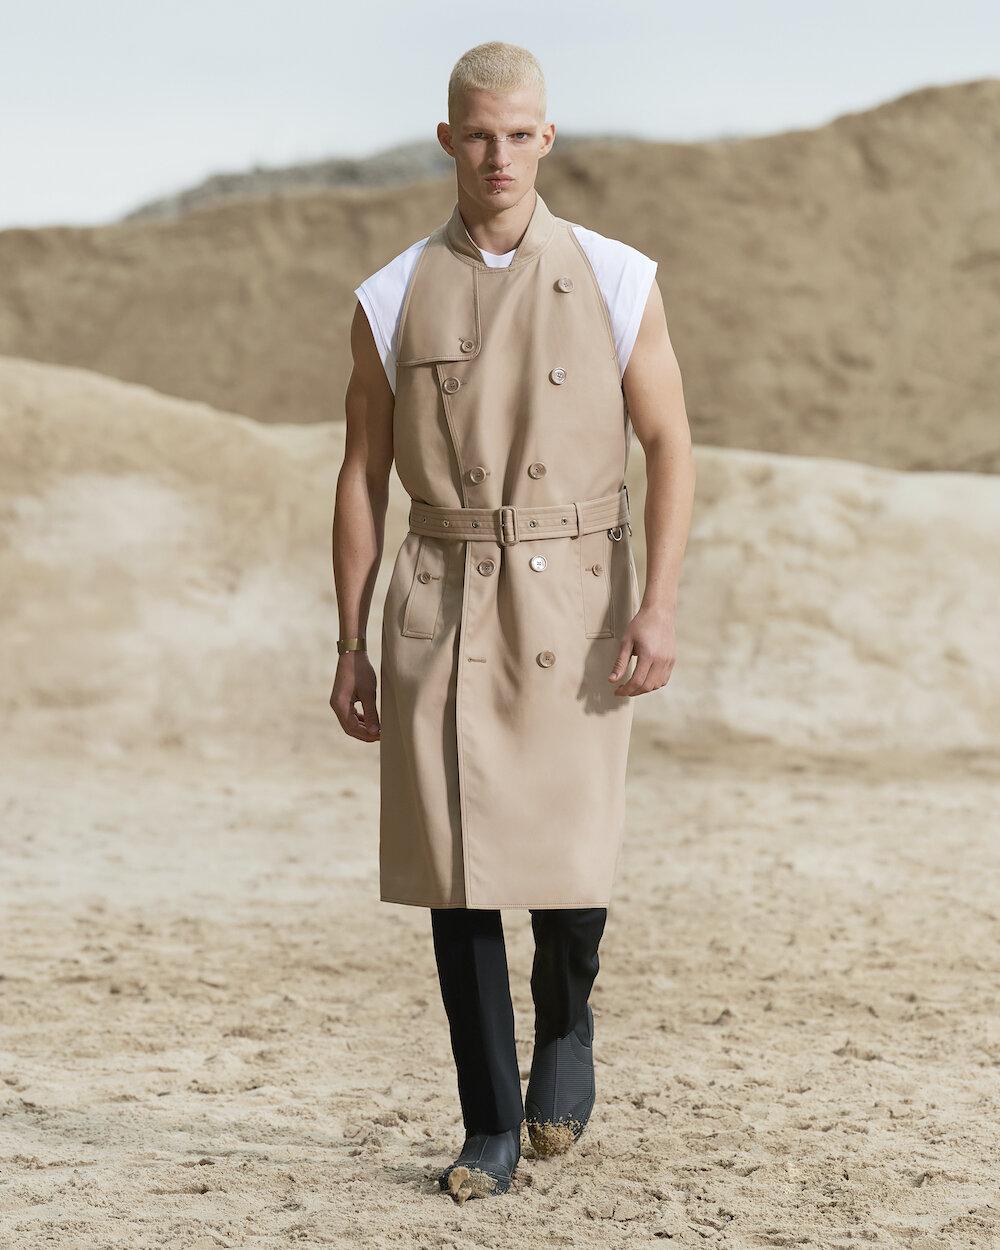 Burberry Spring_Summer 2022 Menswear Presentation Collection - Look 1 - Matteo.jpg